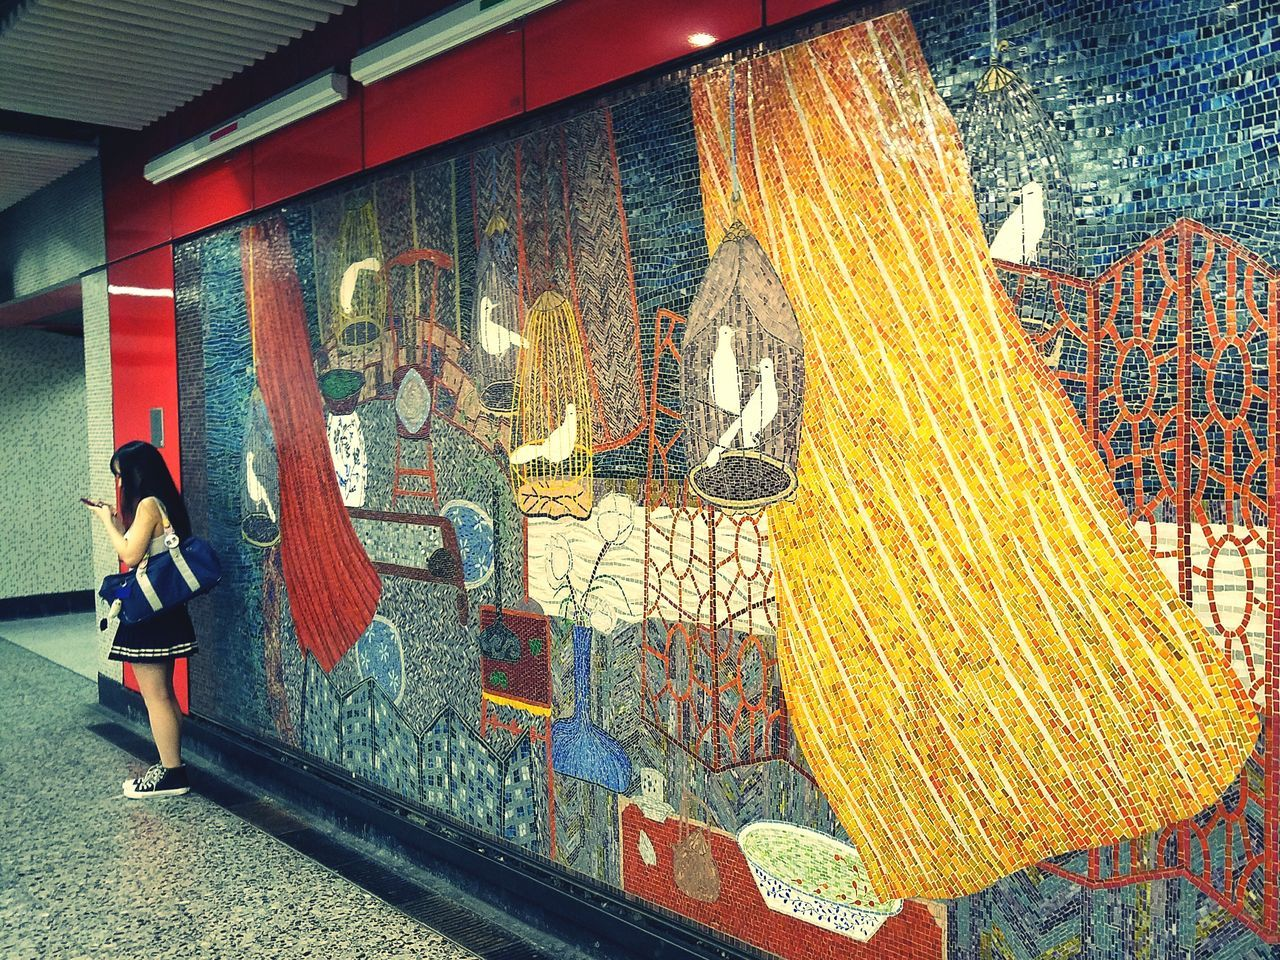 Streetphotography Art ArtWork Mosaic Subway Station One Person Waiting ... Colour Of Life Explore The World EyeEm Best Shots Taking Photos Picofday Pictureoftheday